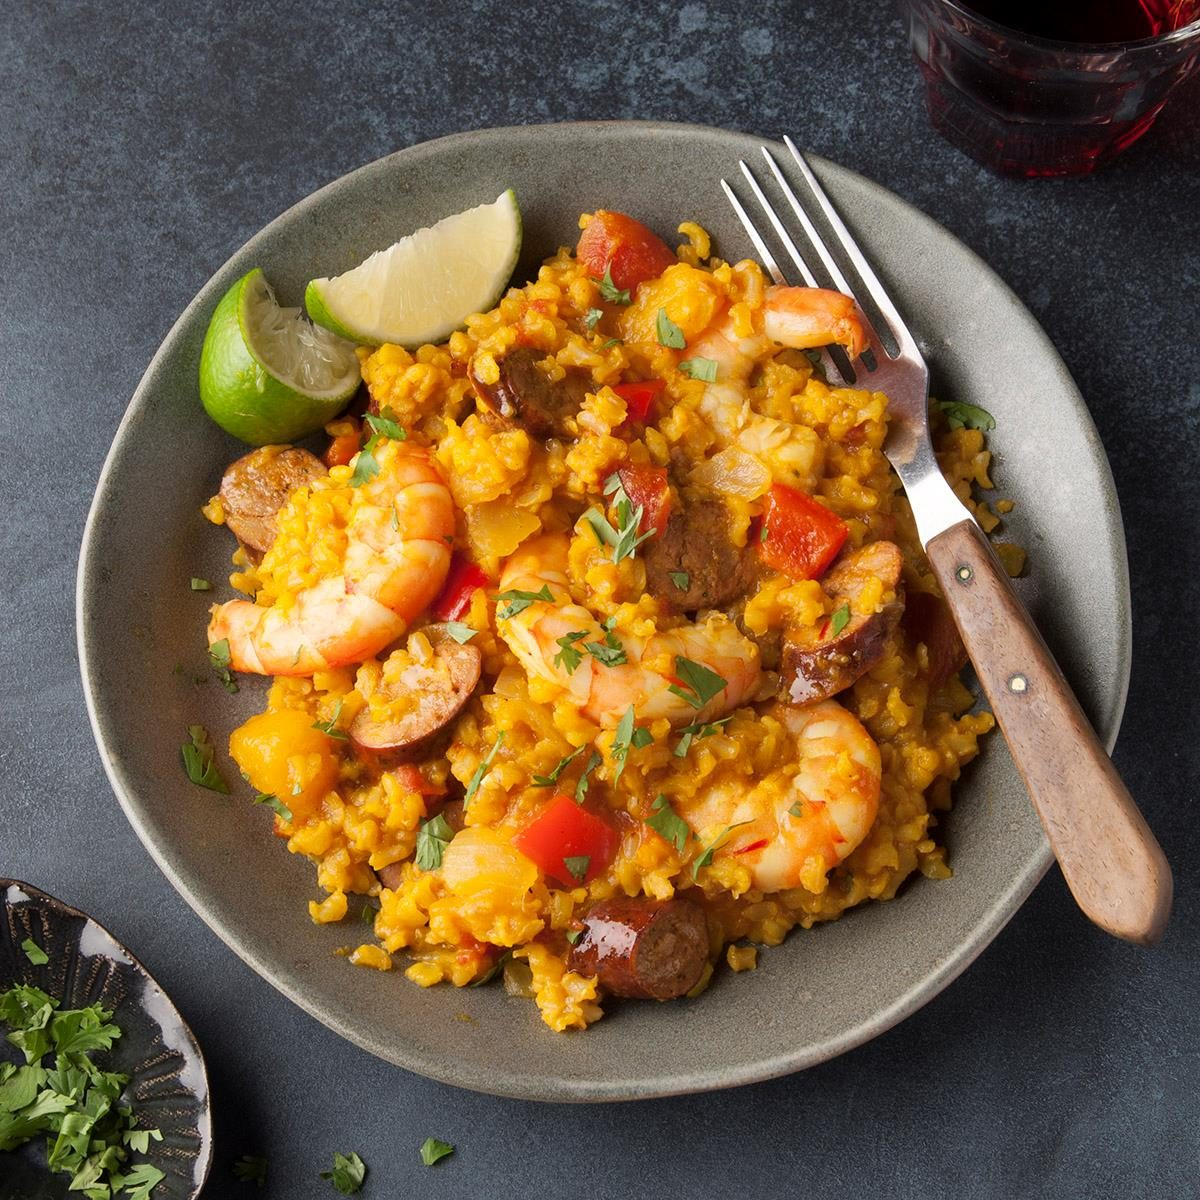 50 Delicious Dutch Oven Recipes